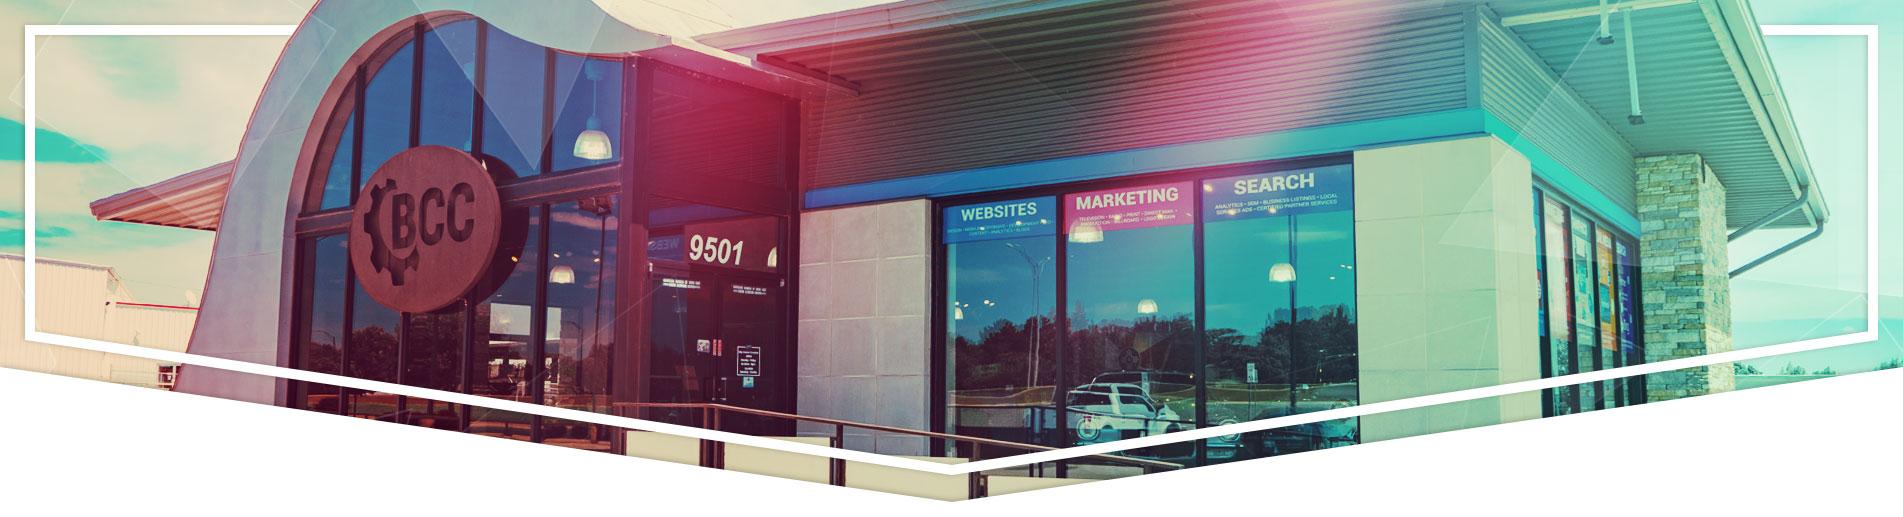 big corner creative bcc storefront